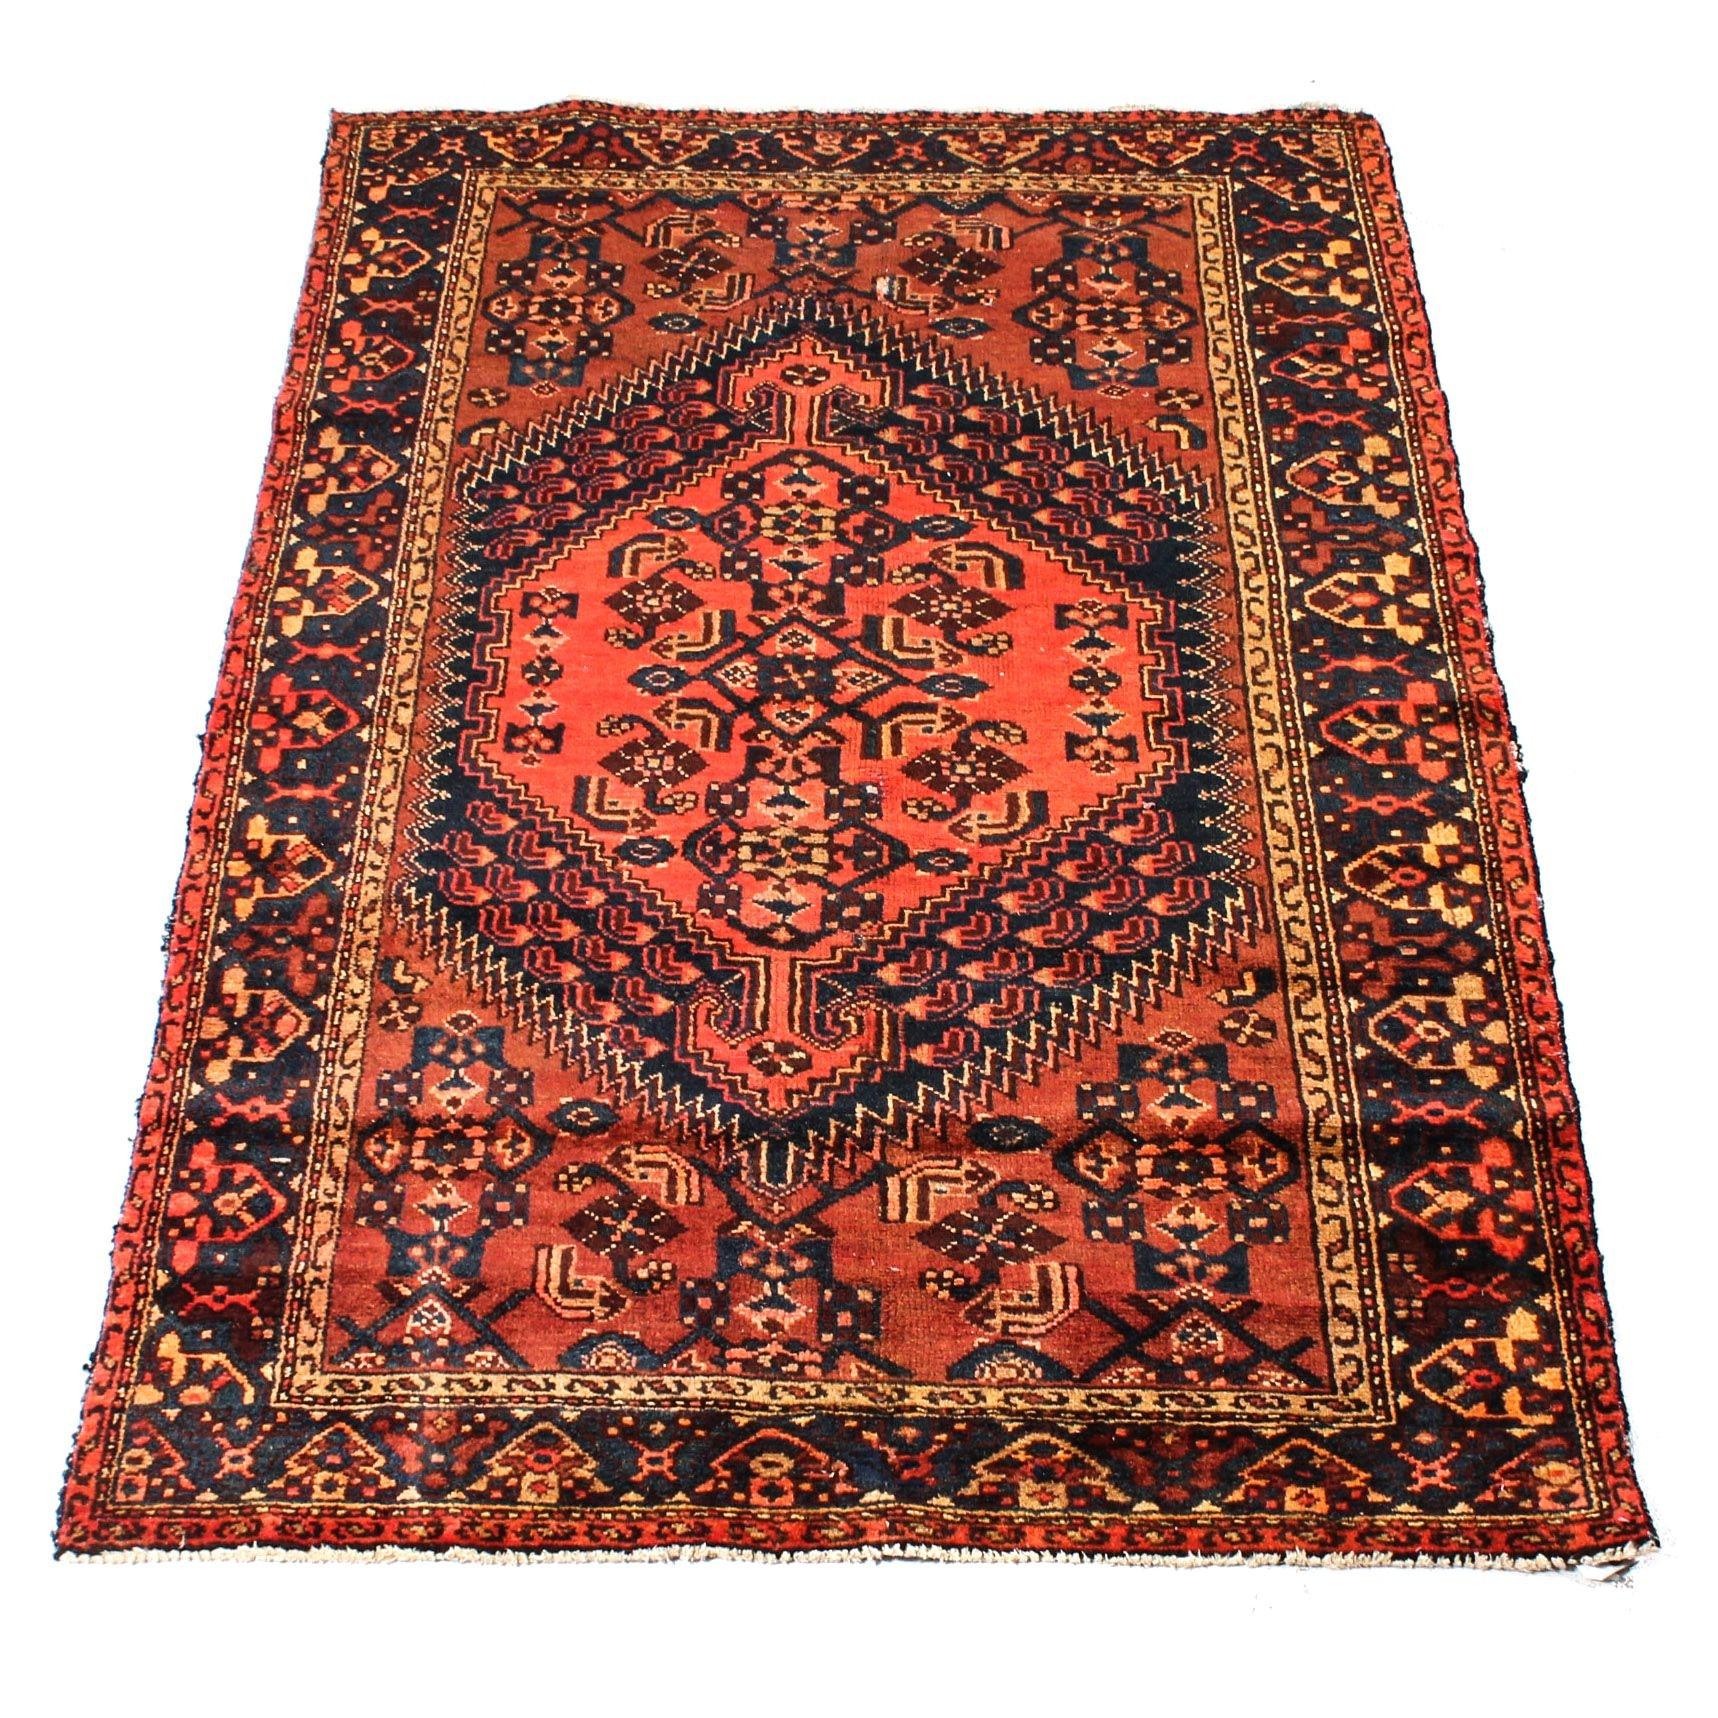 Hand-Knotted Persian Zanjan Rug, circa 1930